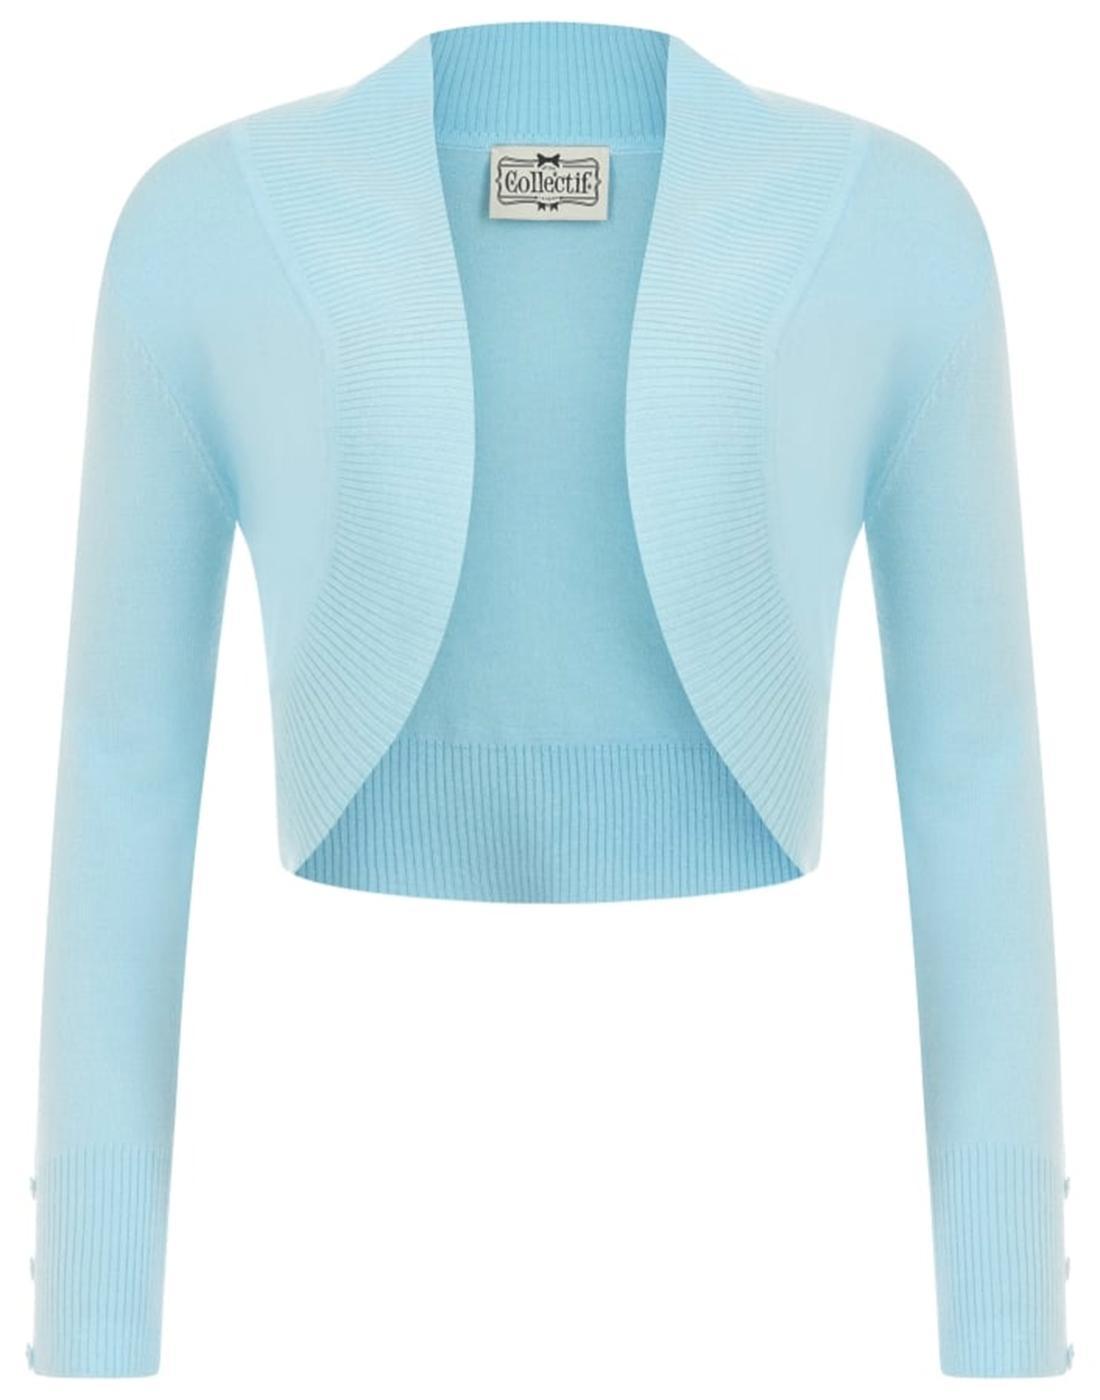 Jean COLLECTIF Vintage 50s Bolero Cardigan Blue